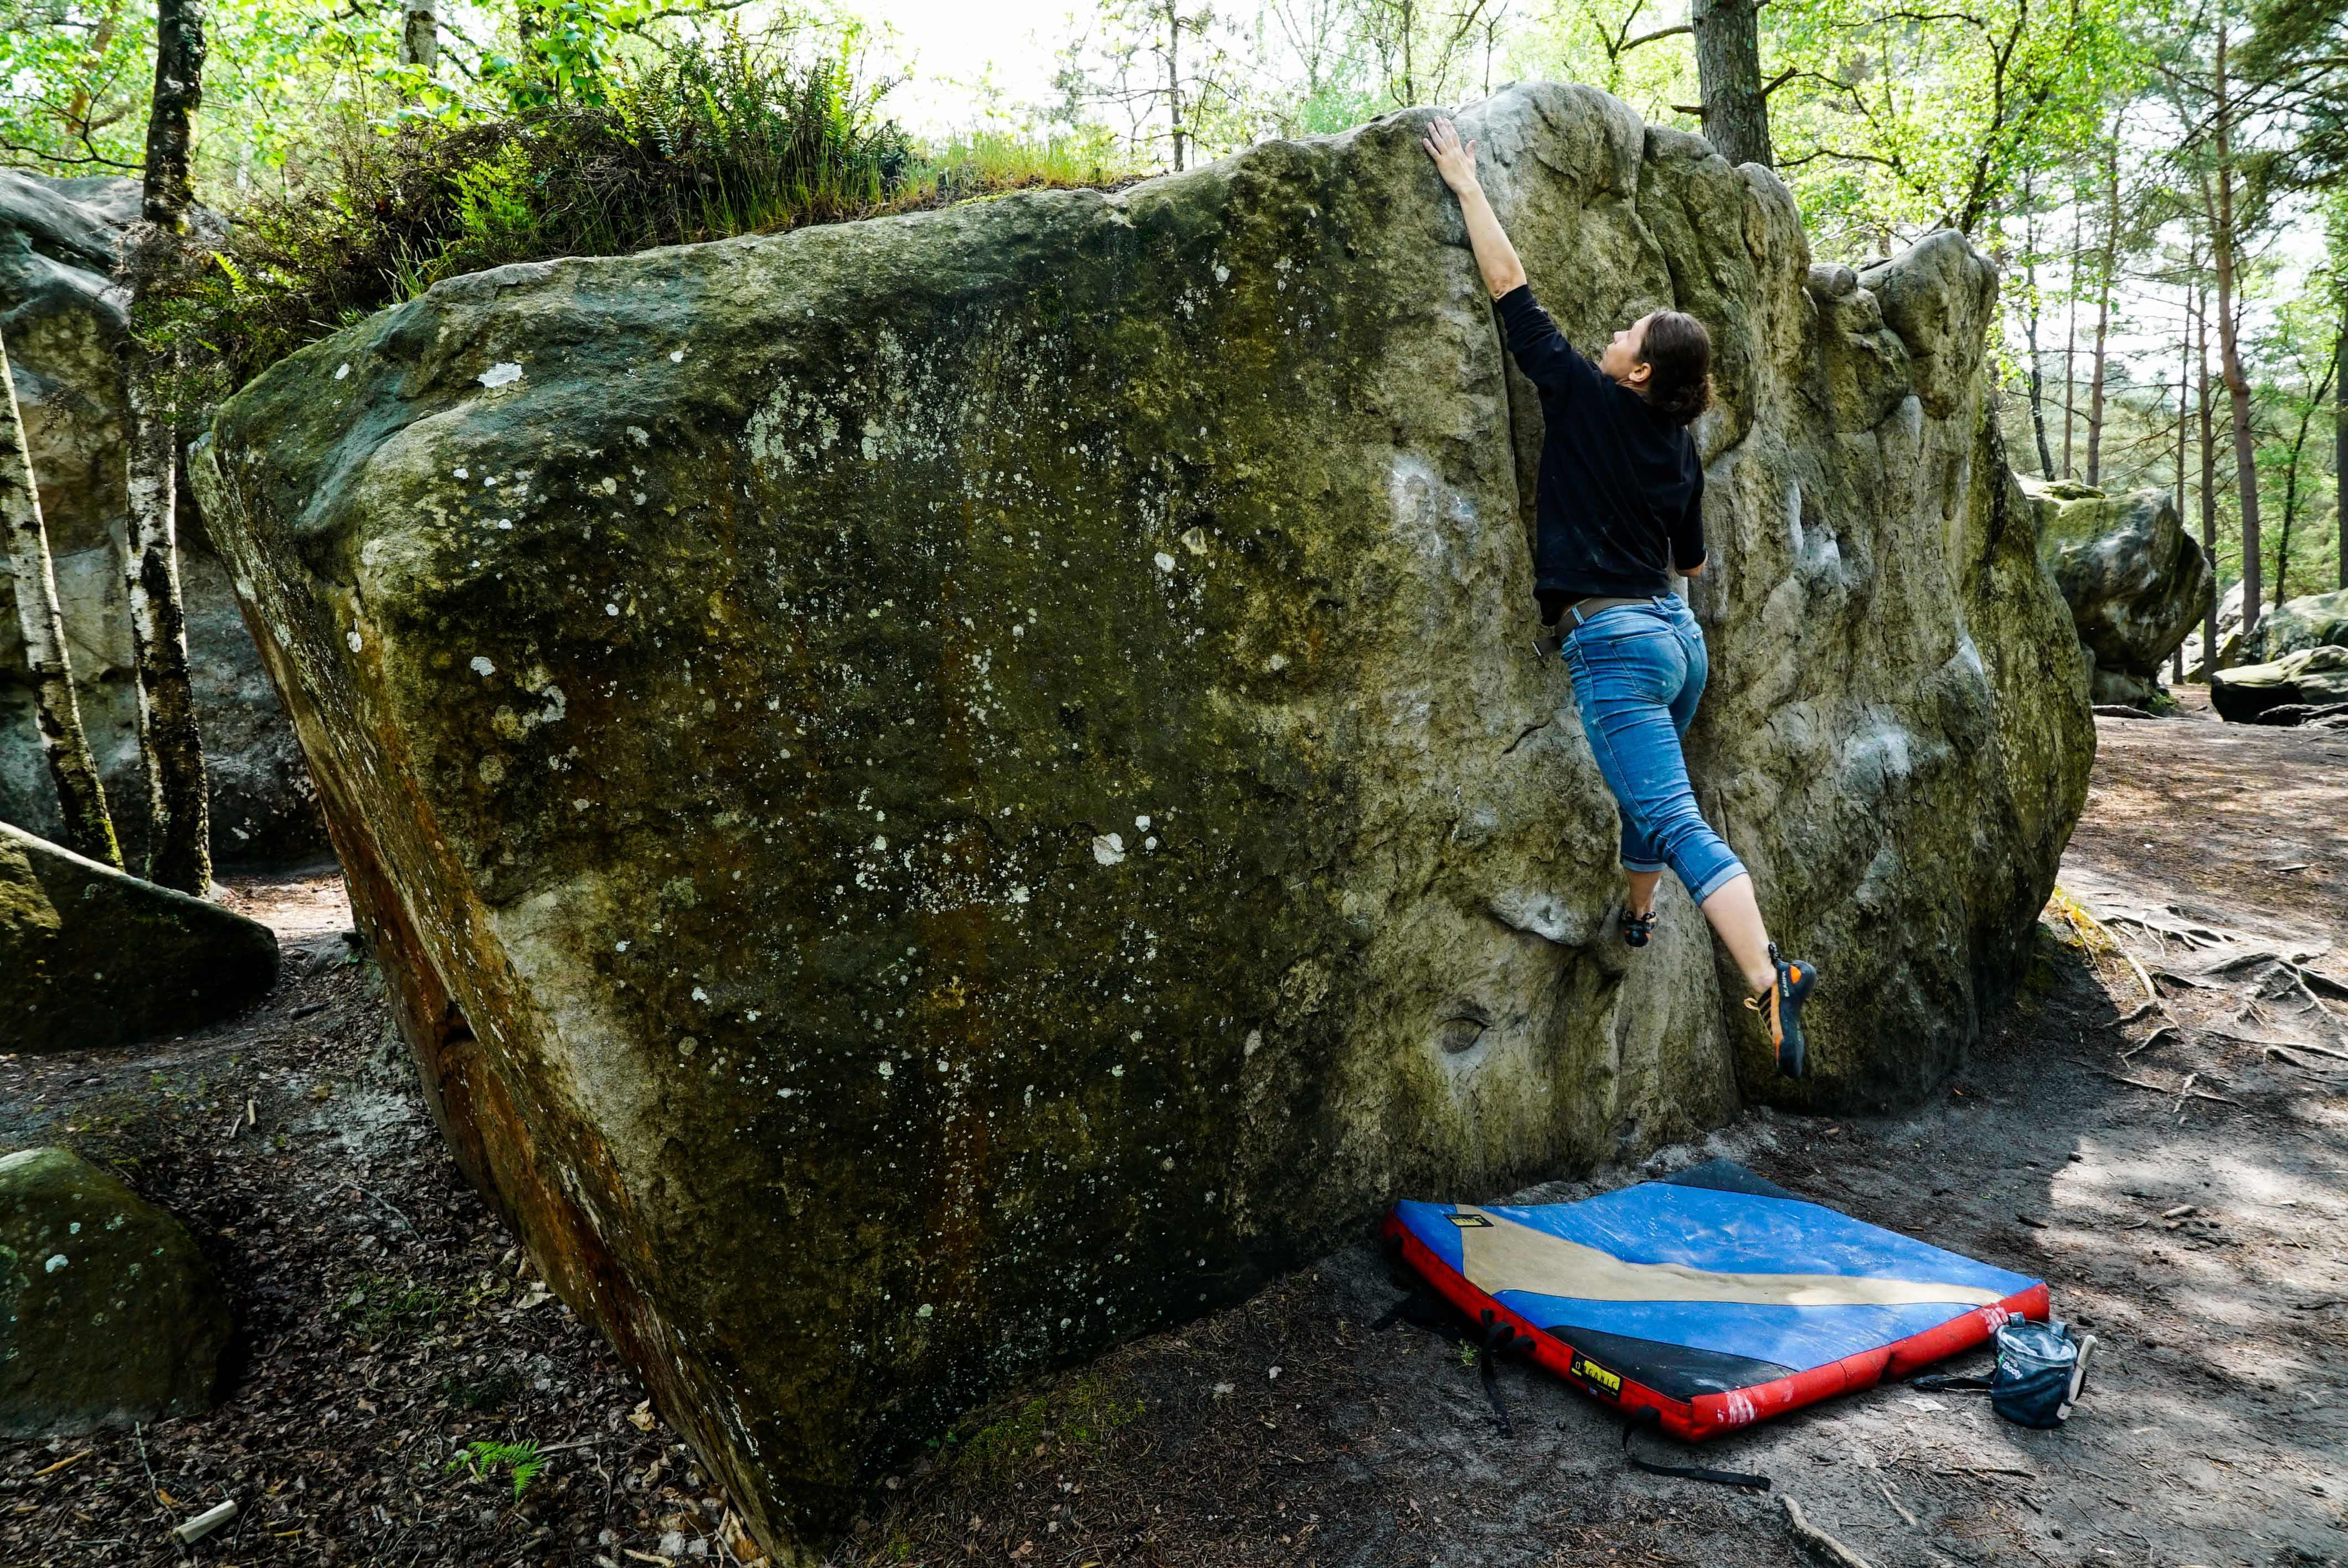 fontainbleau climbing 2016 mike brindley-68